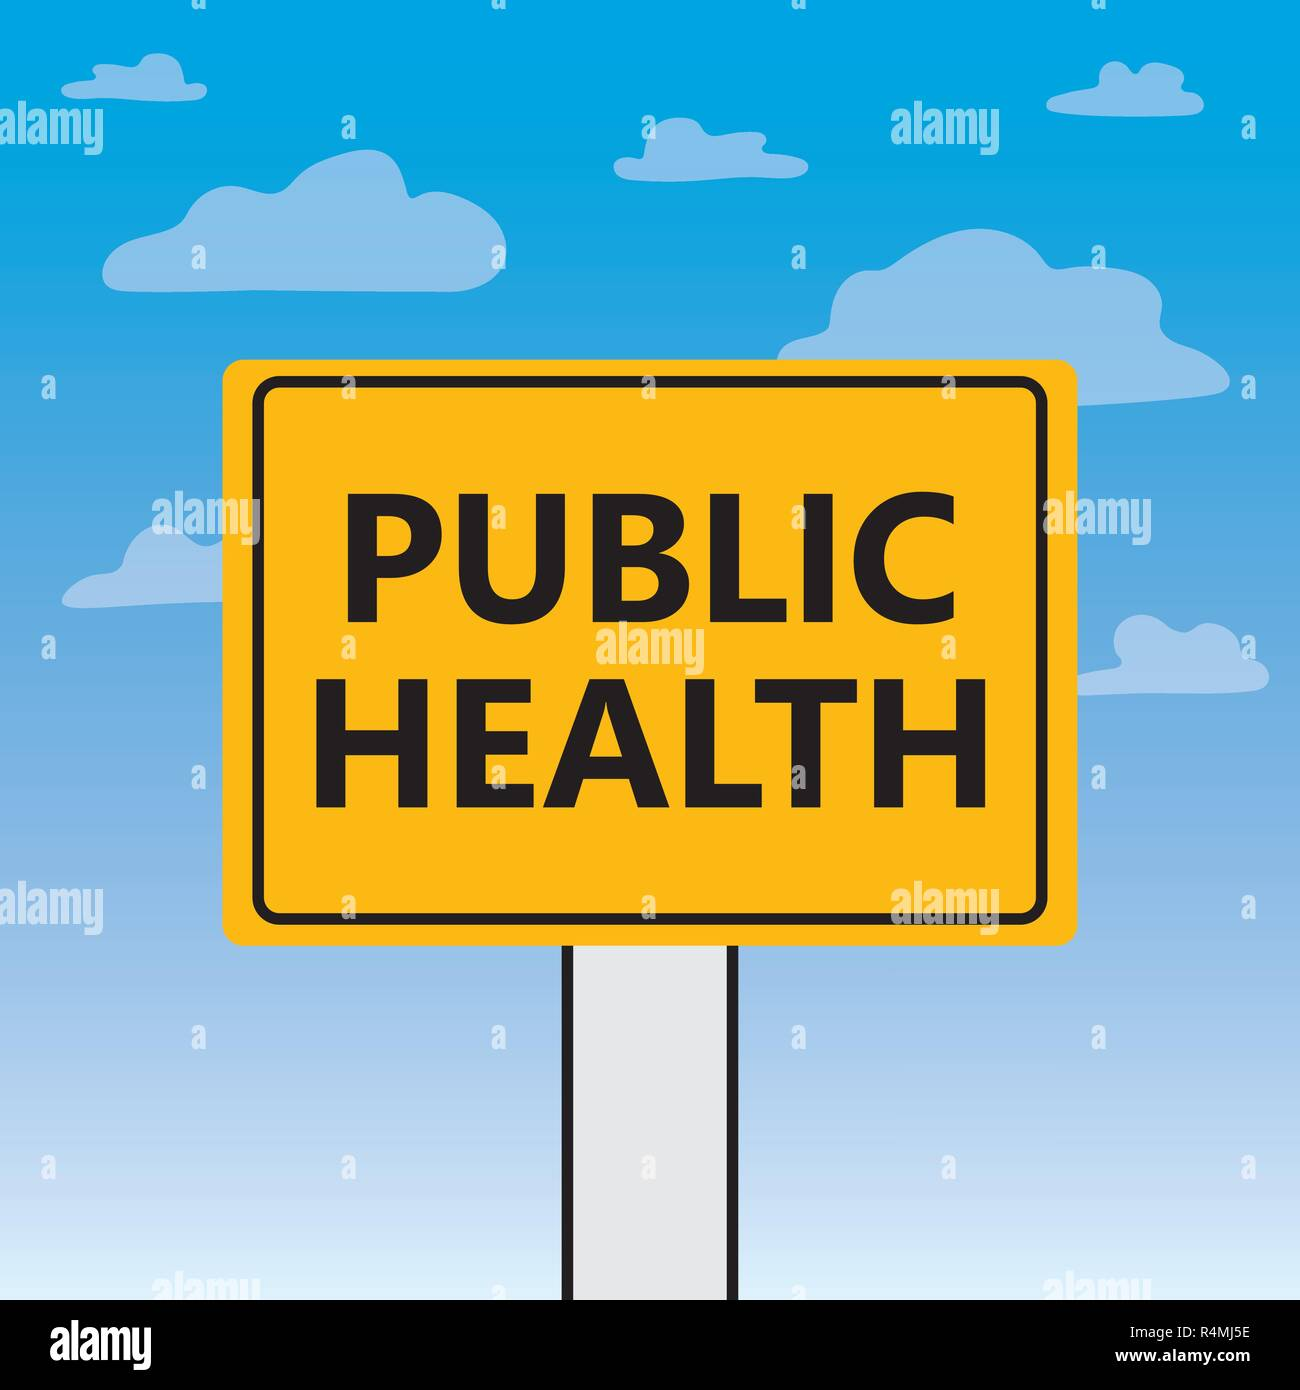 public health written on a billboard- vector illustration - Stock Image